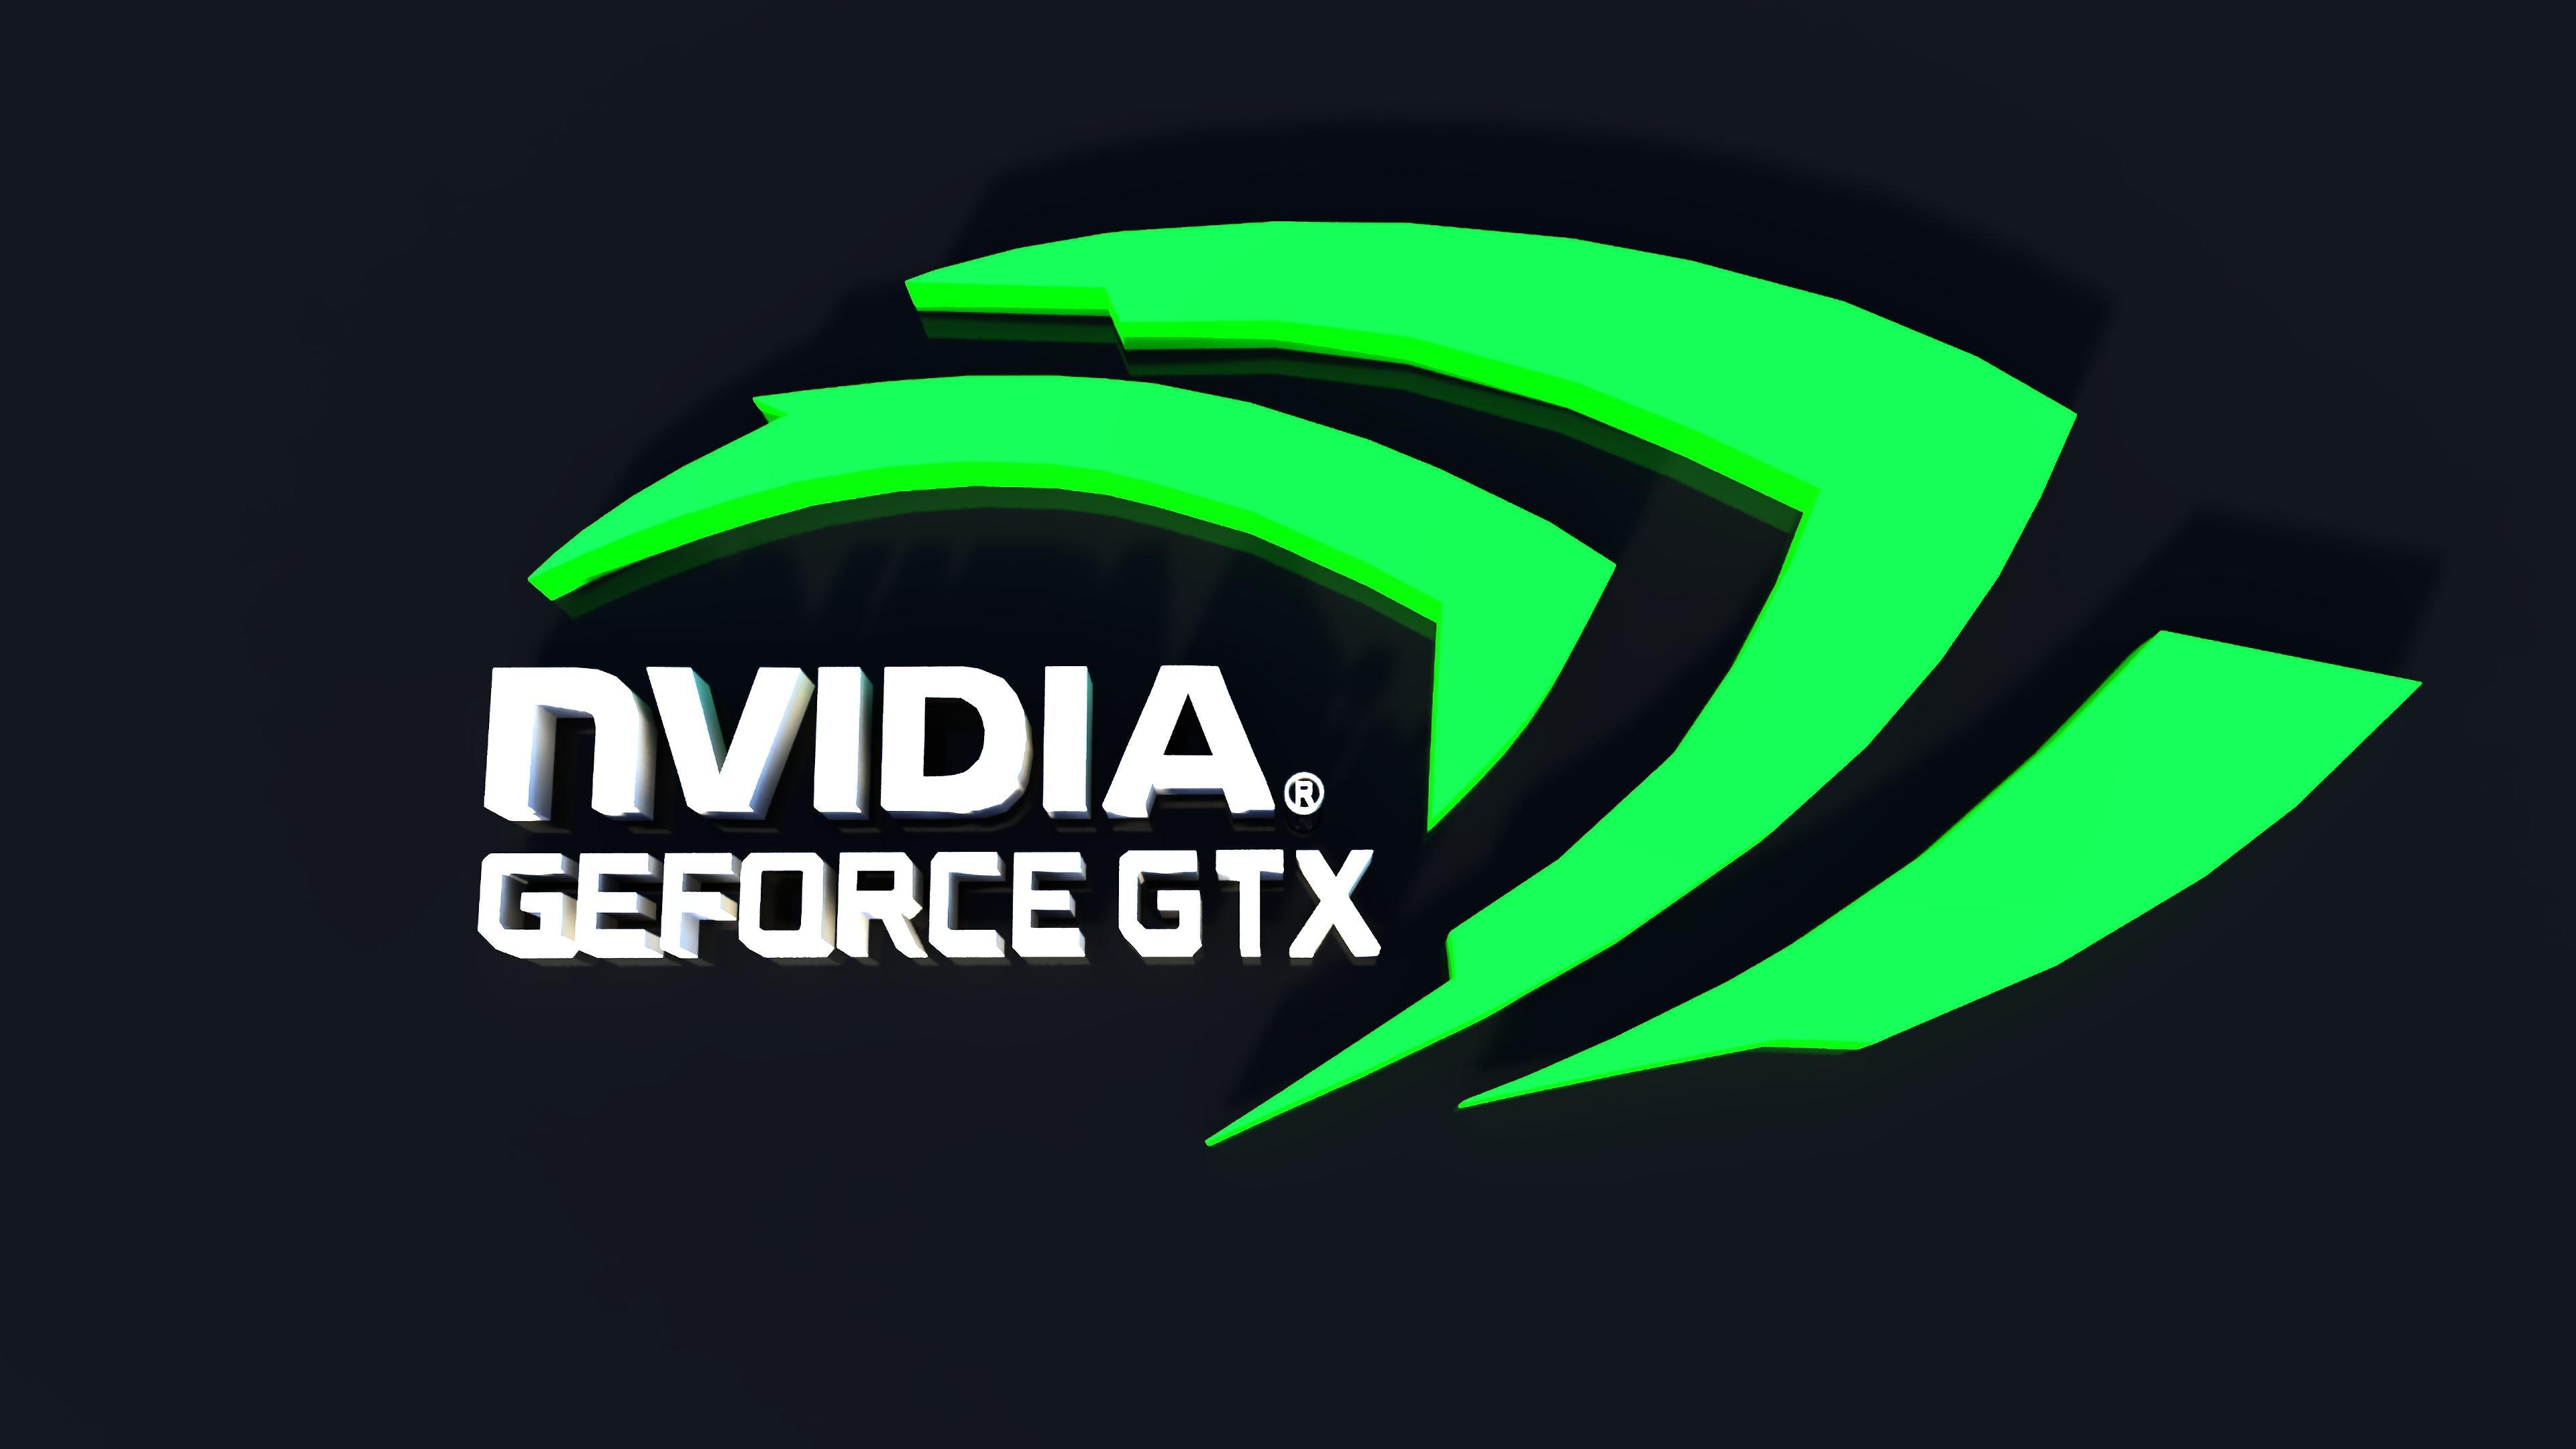 Nvidia Geforce 4k Wallpapers Top Free Nvidia Geforce 4k